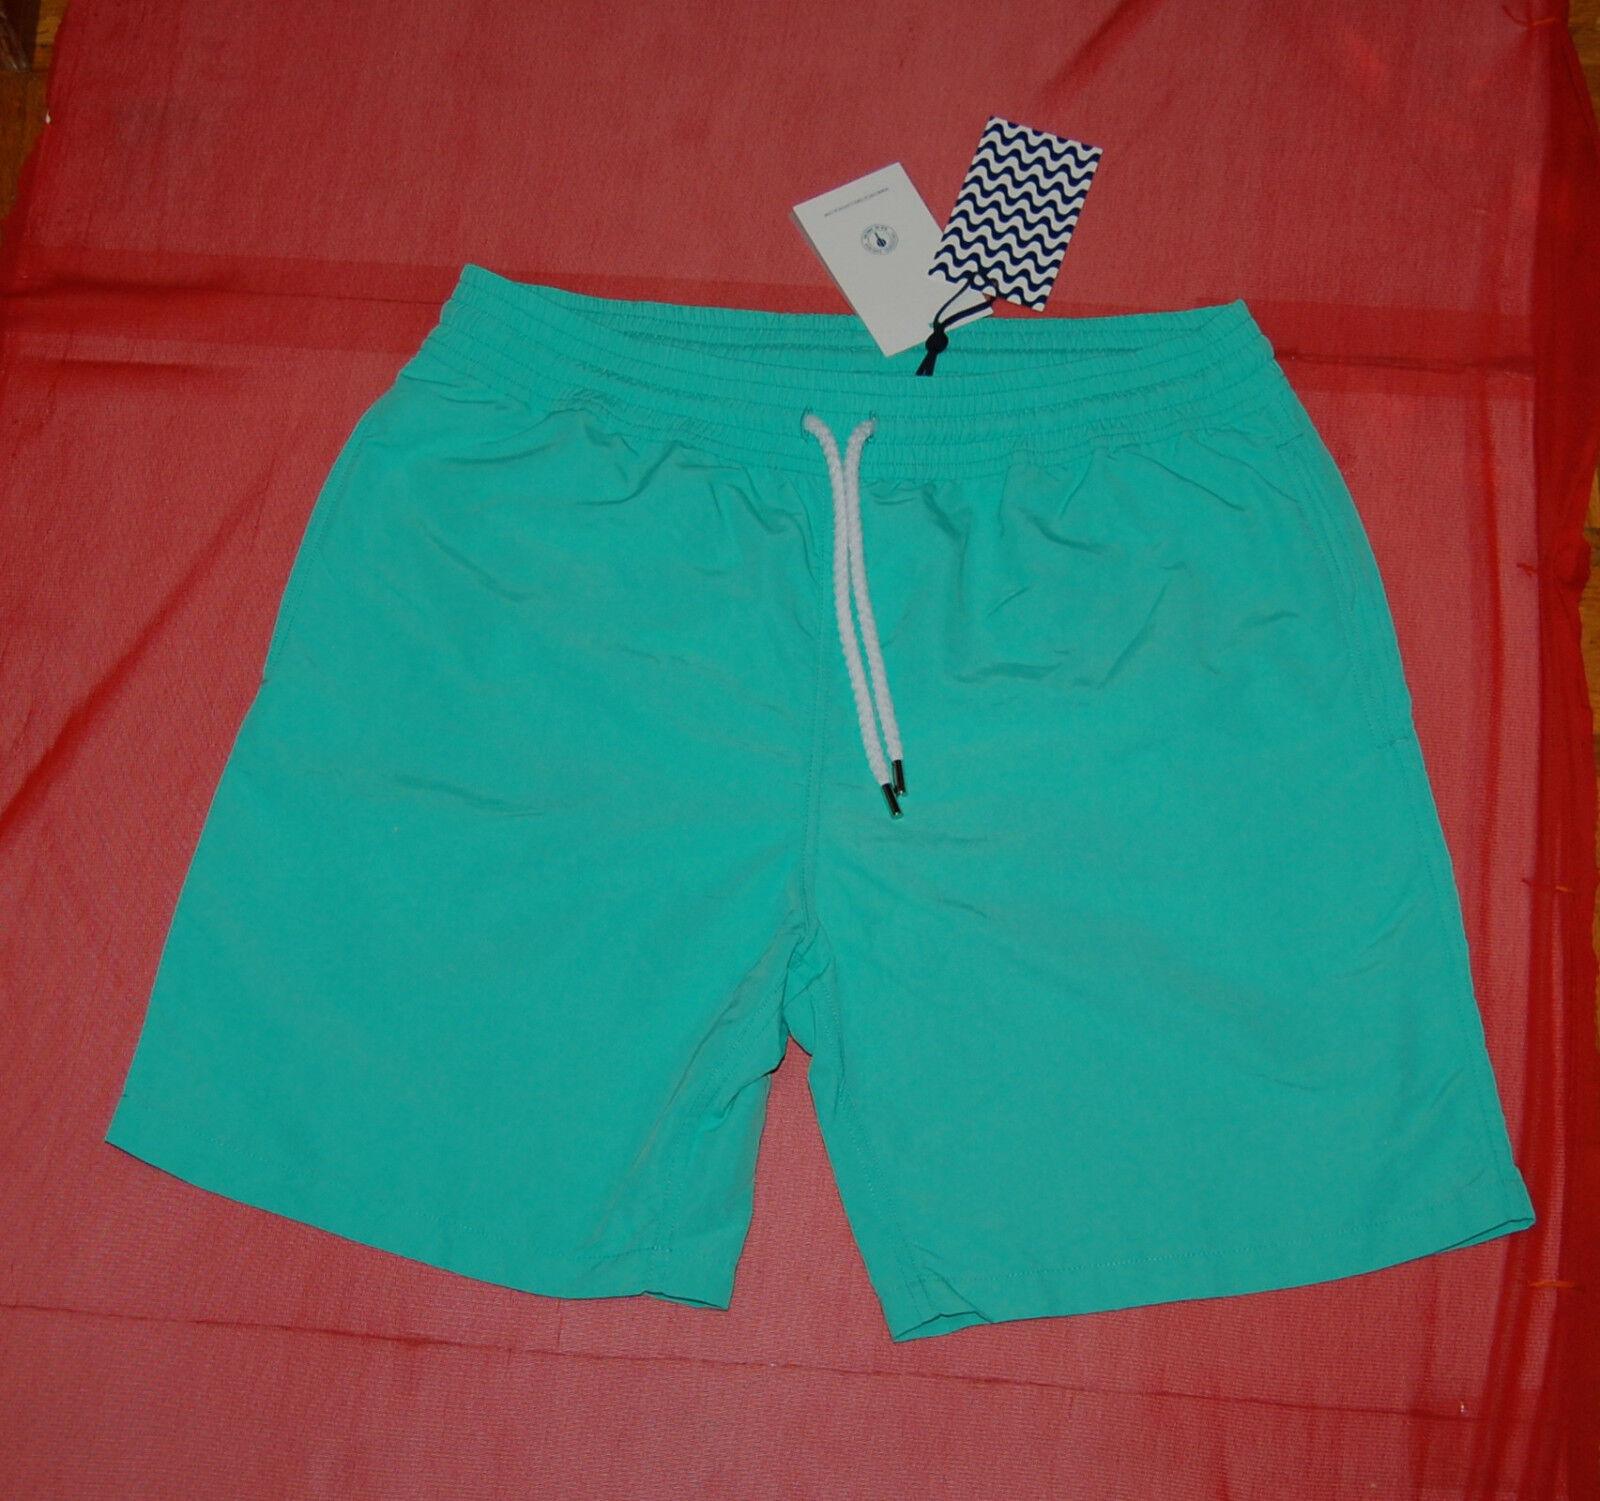 NWT FRESCOBOL CARIOCA mens green swim trunk boxer size XL  no bag